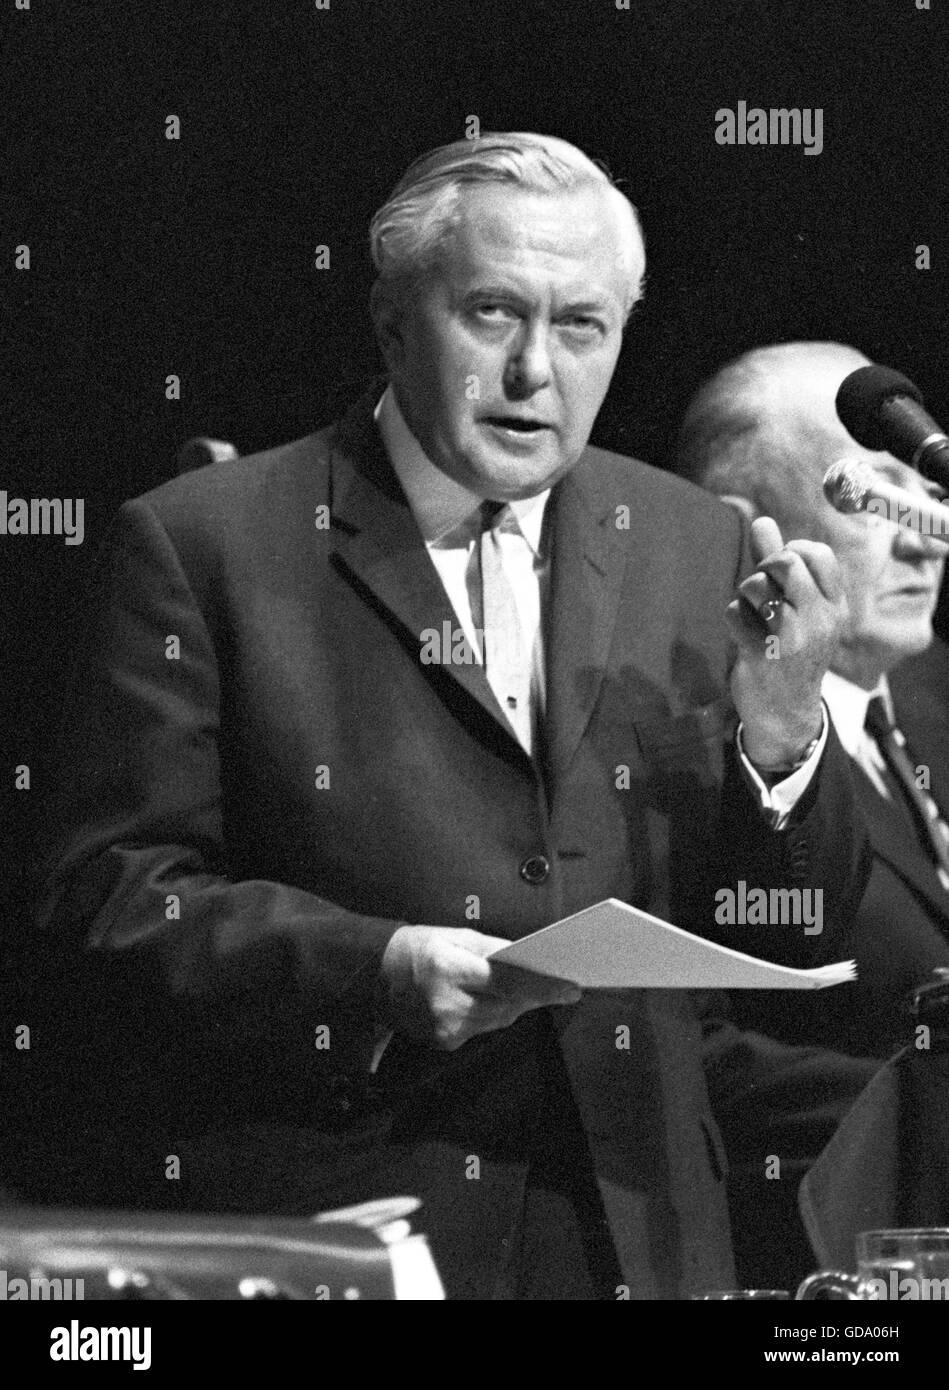 Prime Minister Harold Wilson - Stock Image